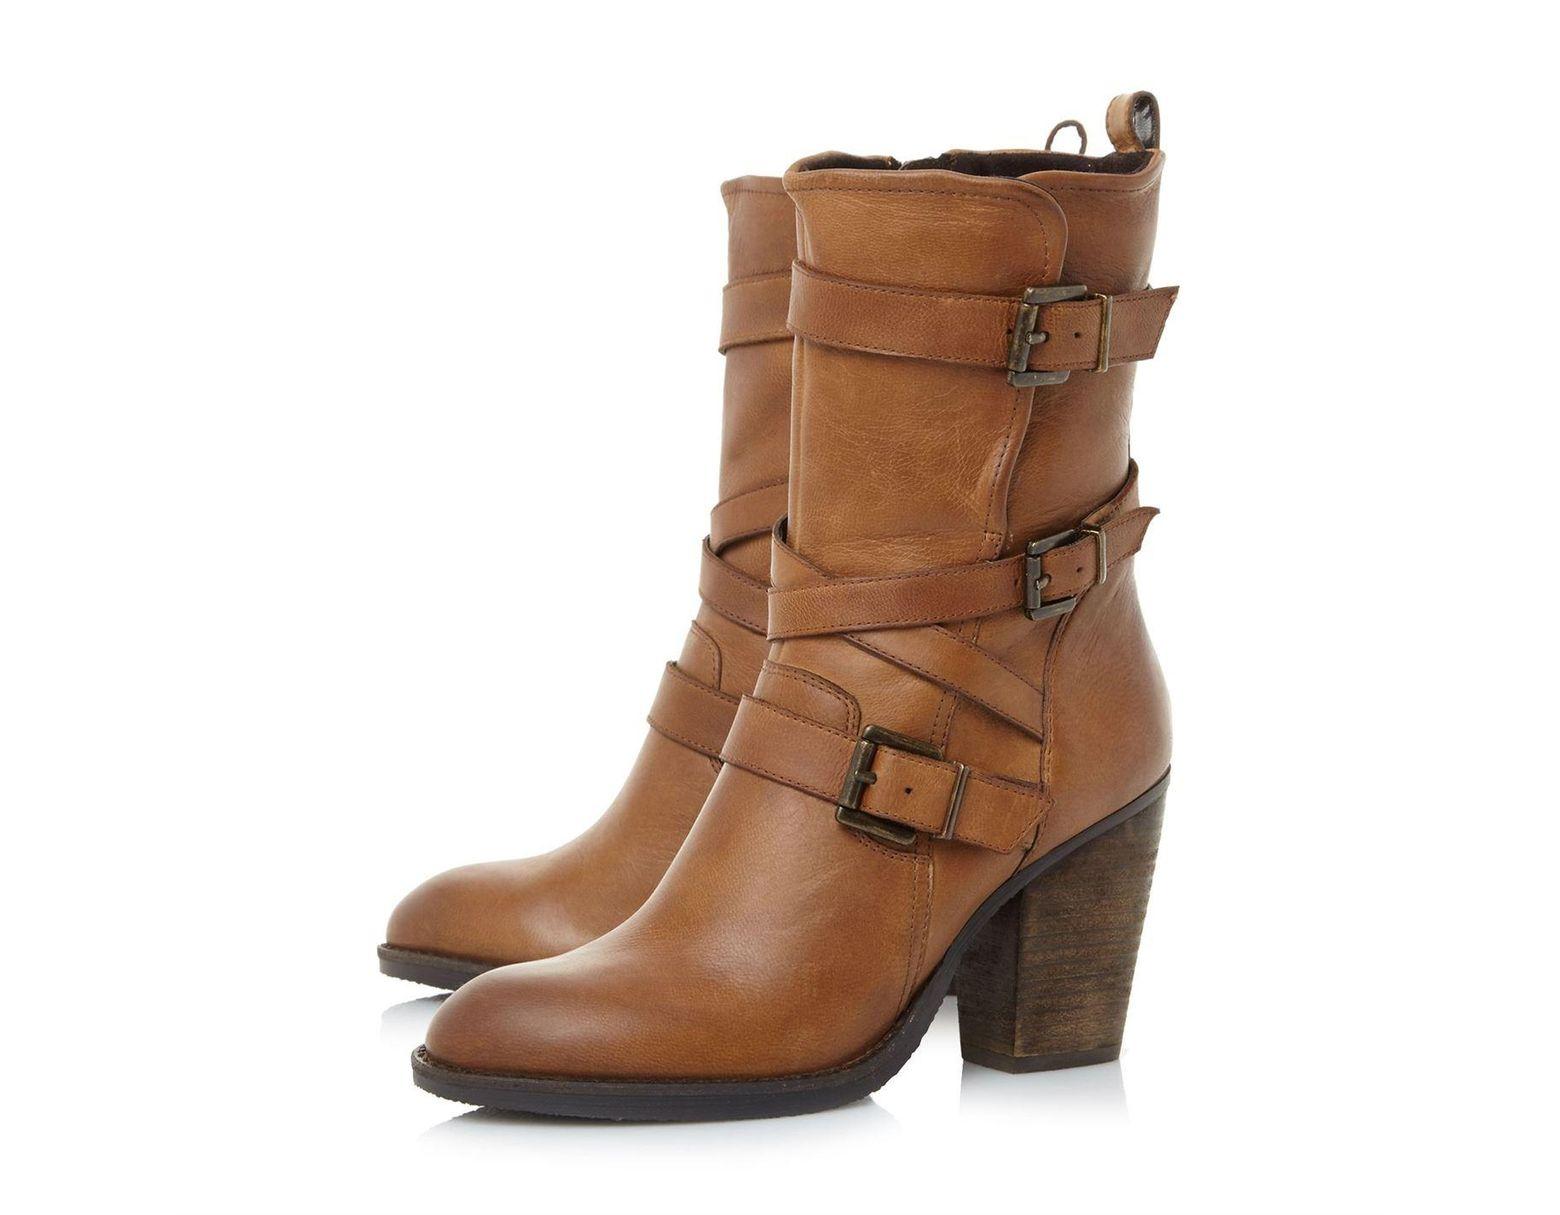 37ab8bbd7e7 Women's Brown Wen Sm Heeled Buckle Calf Boots